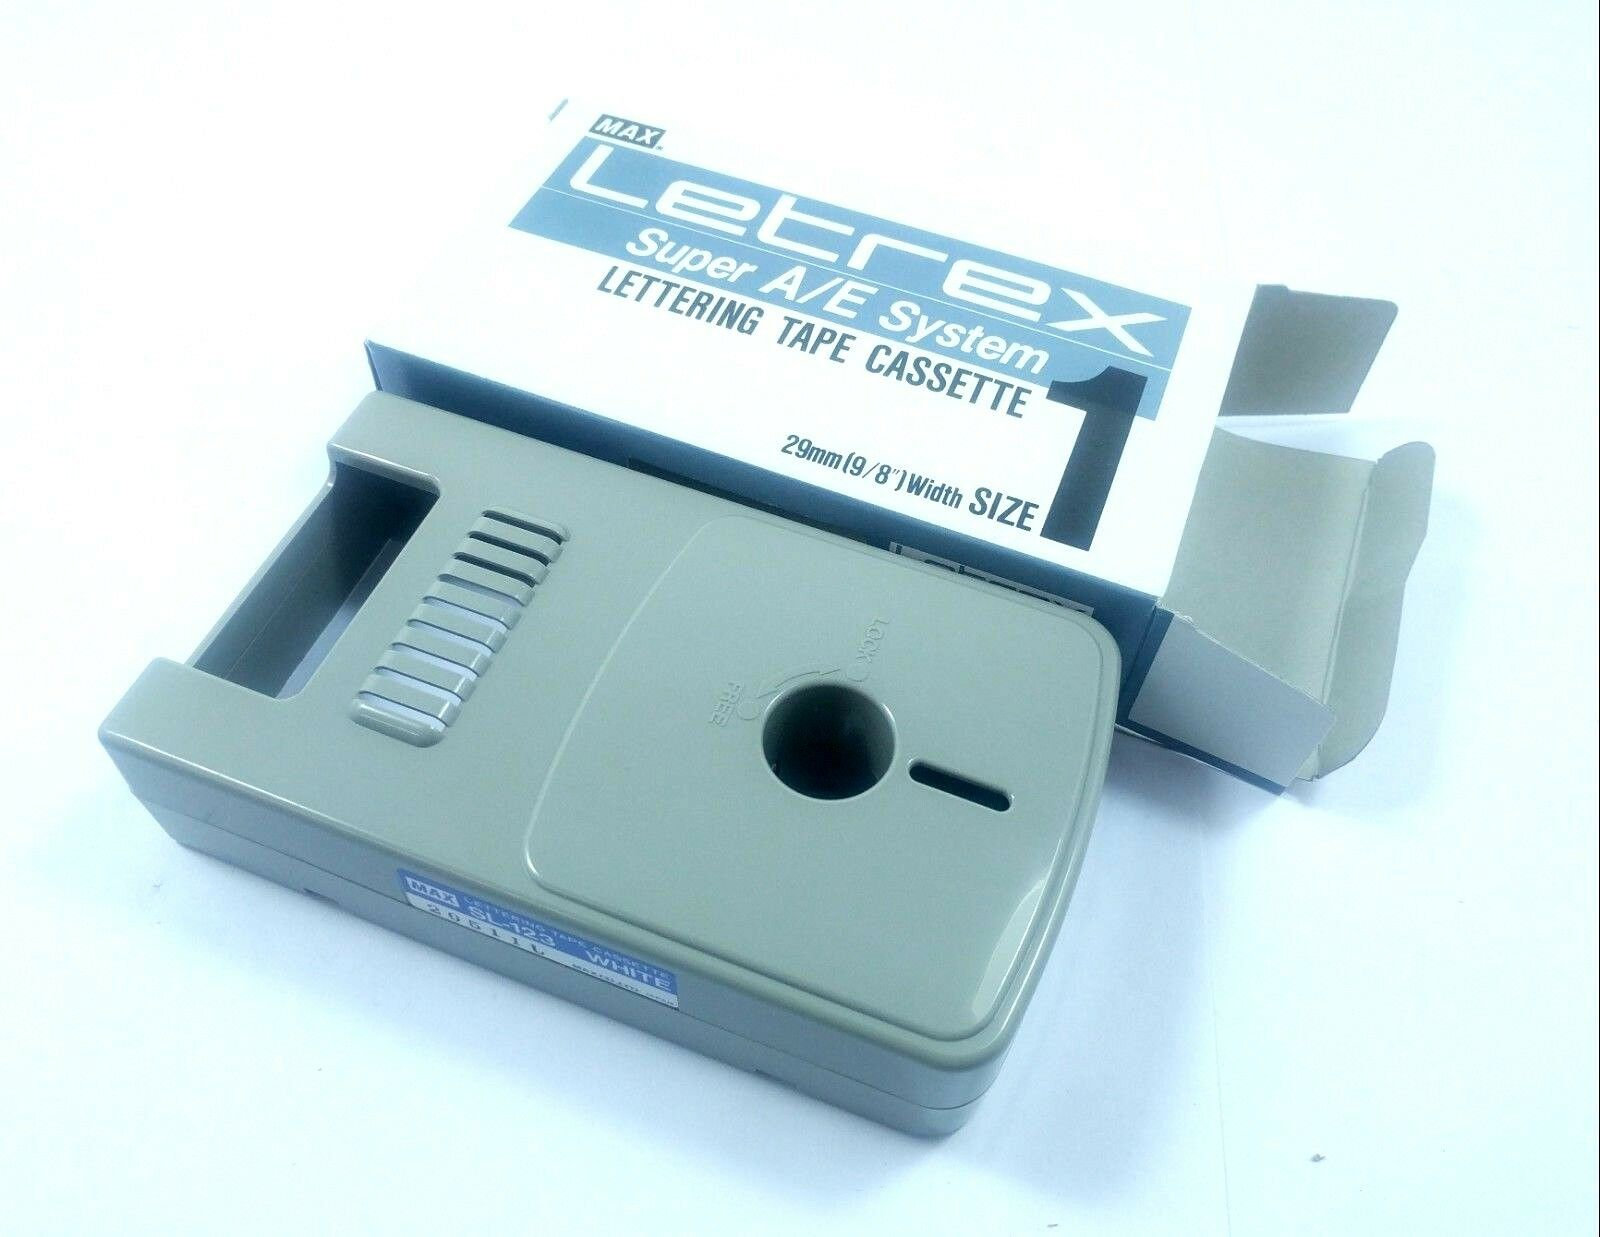 4x New MAX SL-123 Leterx Super A E System Lettering Tape Cassette